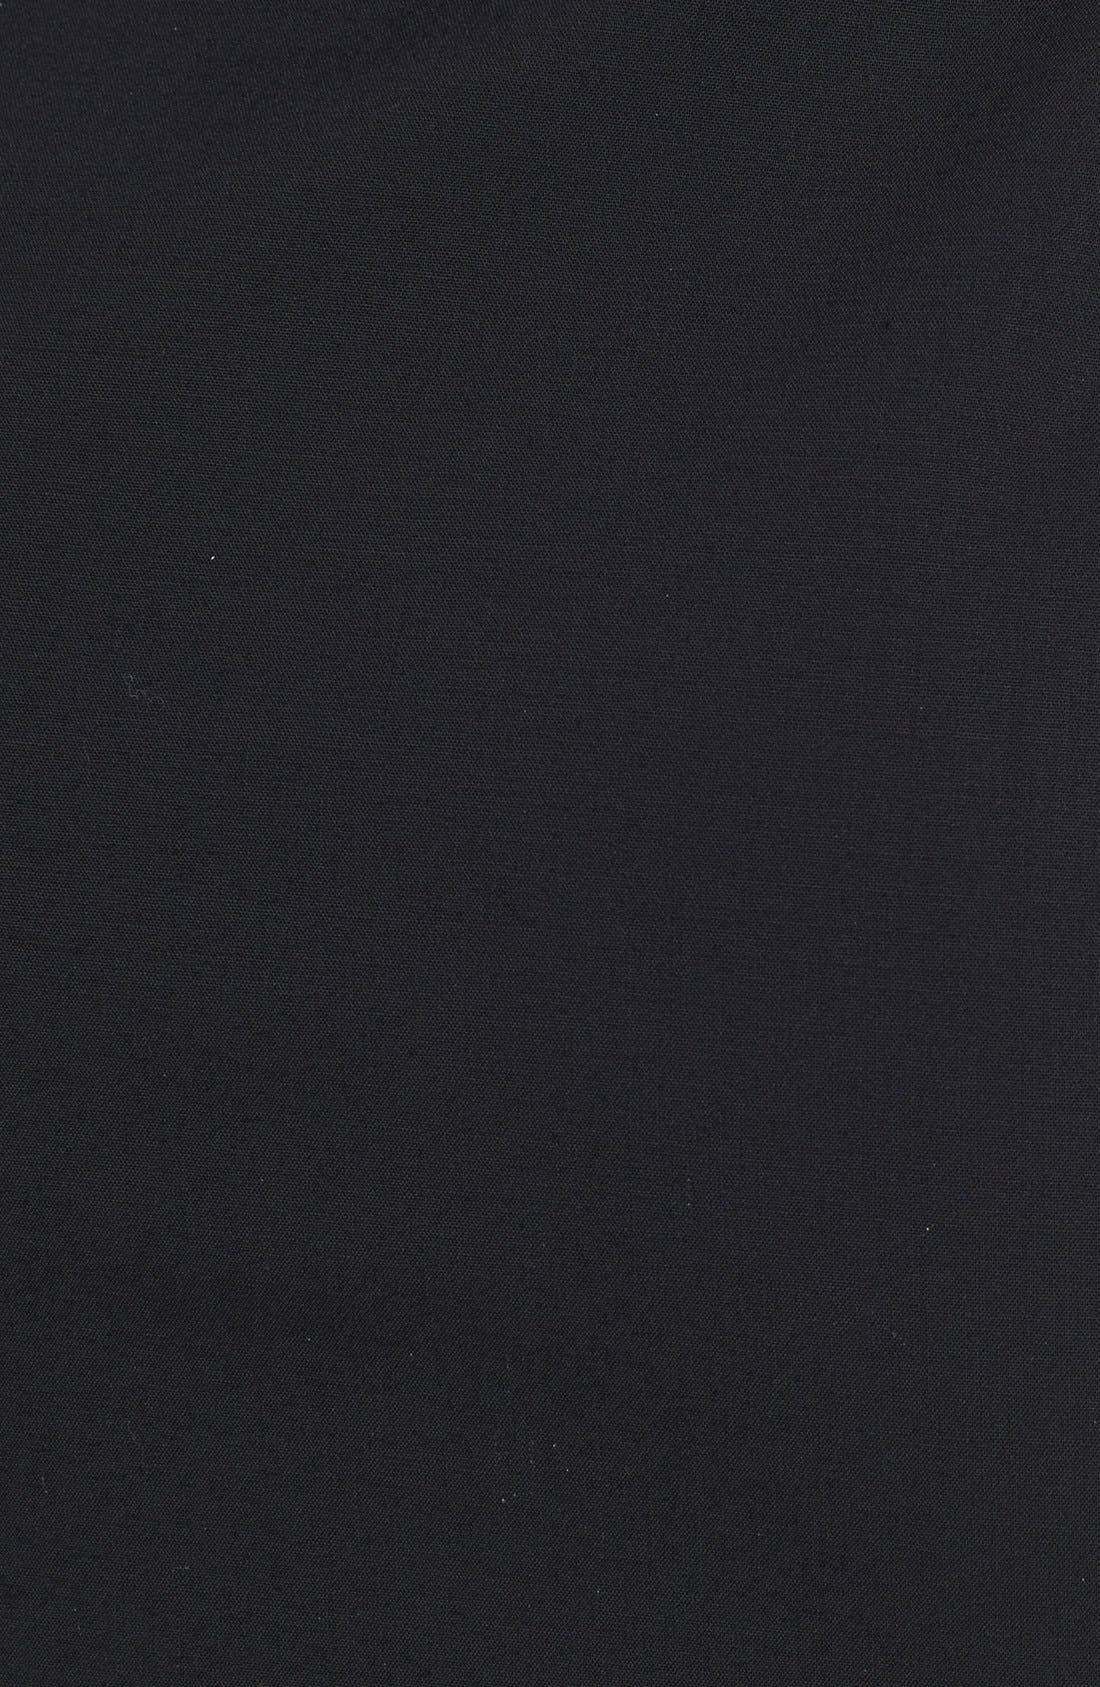 Stretch Wool Pencil Skirt,                             Alternate thumbnail 8, color,                             BLACK